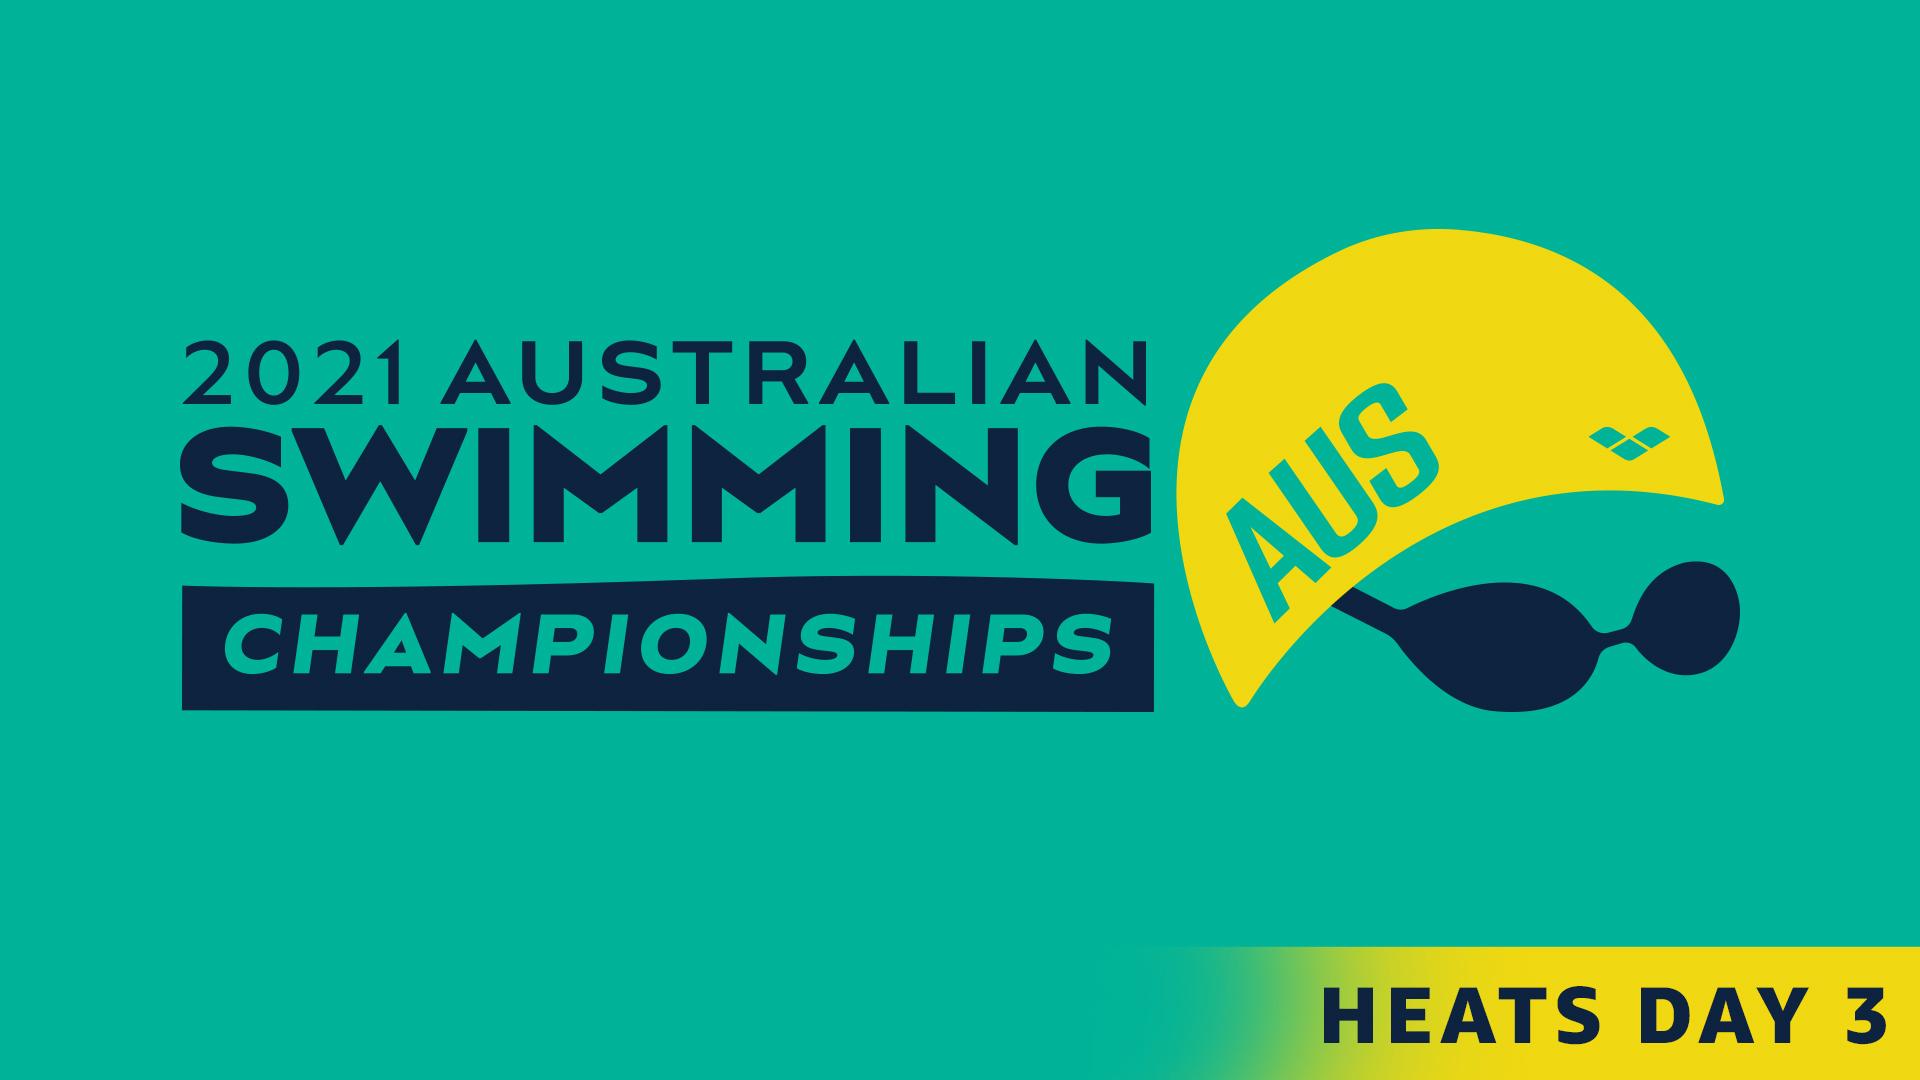 Australian Swimming Championships: Day 3 Heats